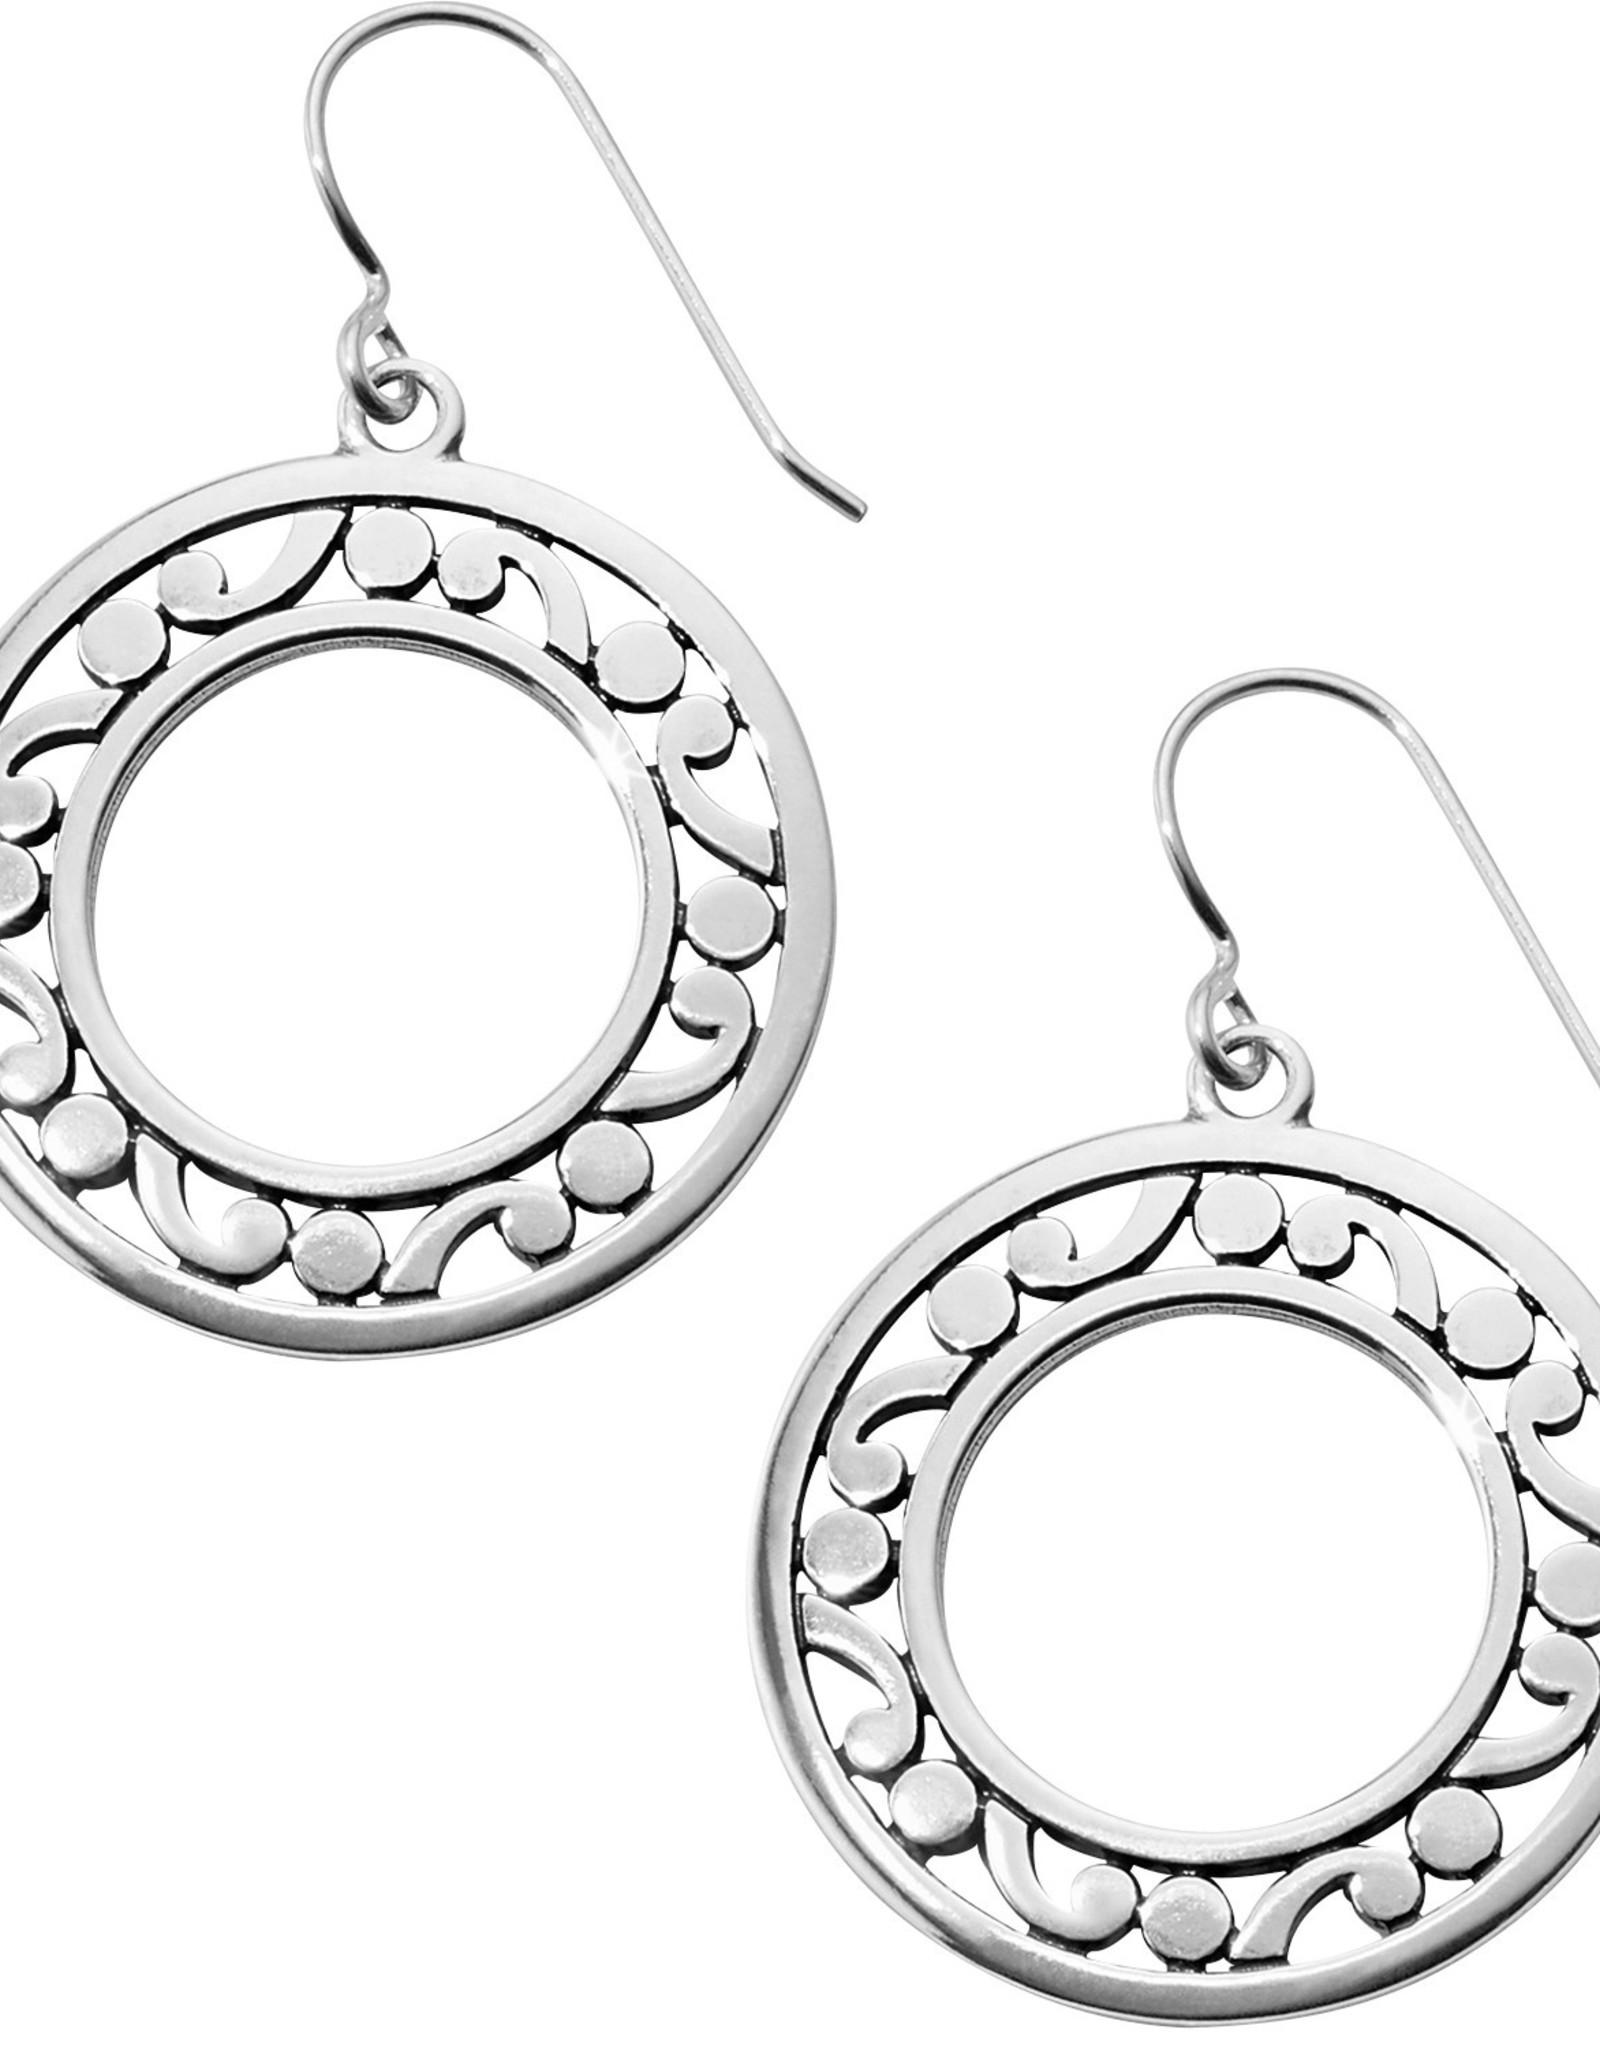 Brighton Brighton Earrings Contempo Open Ring French Wire